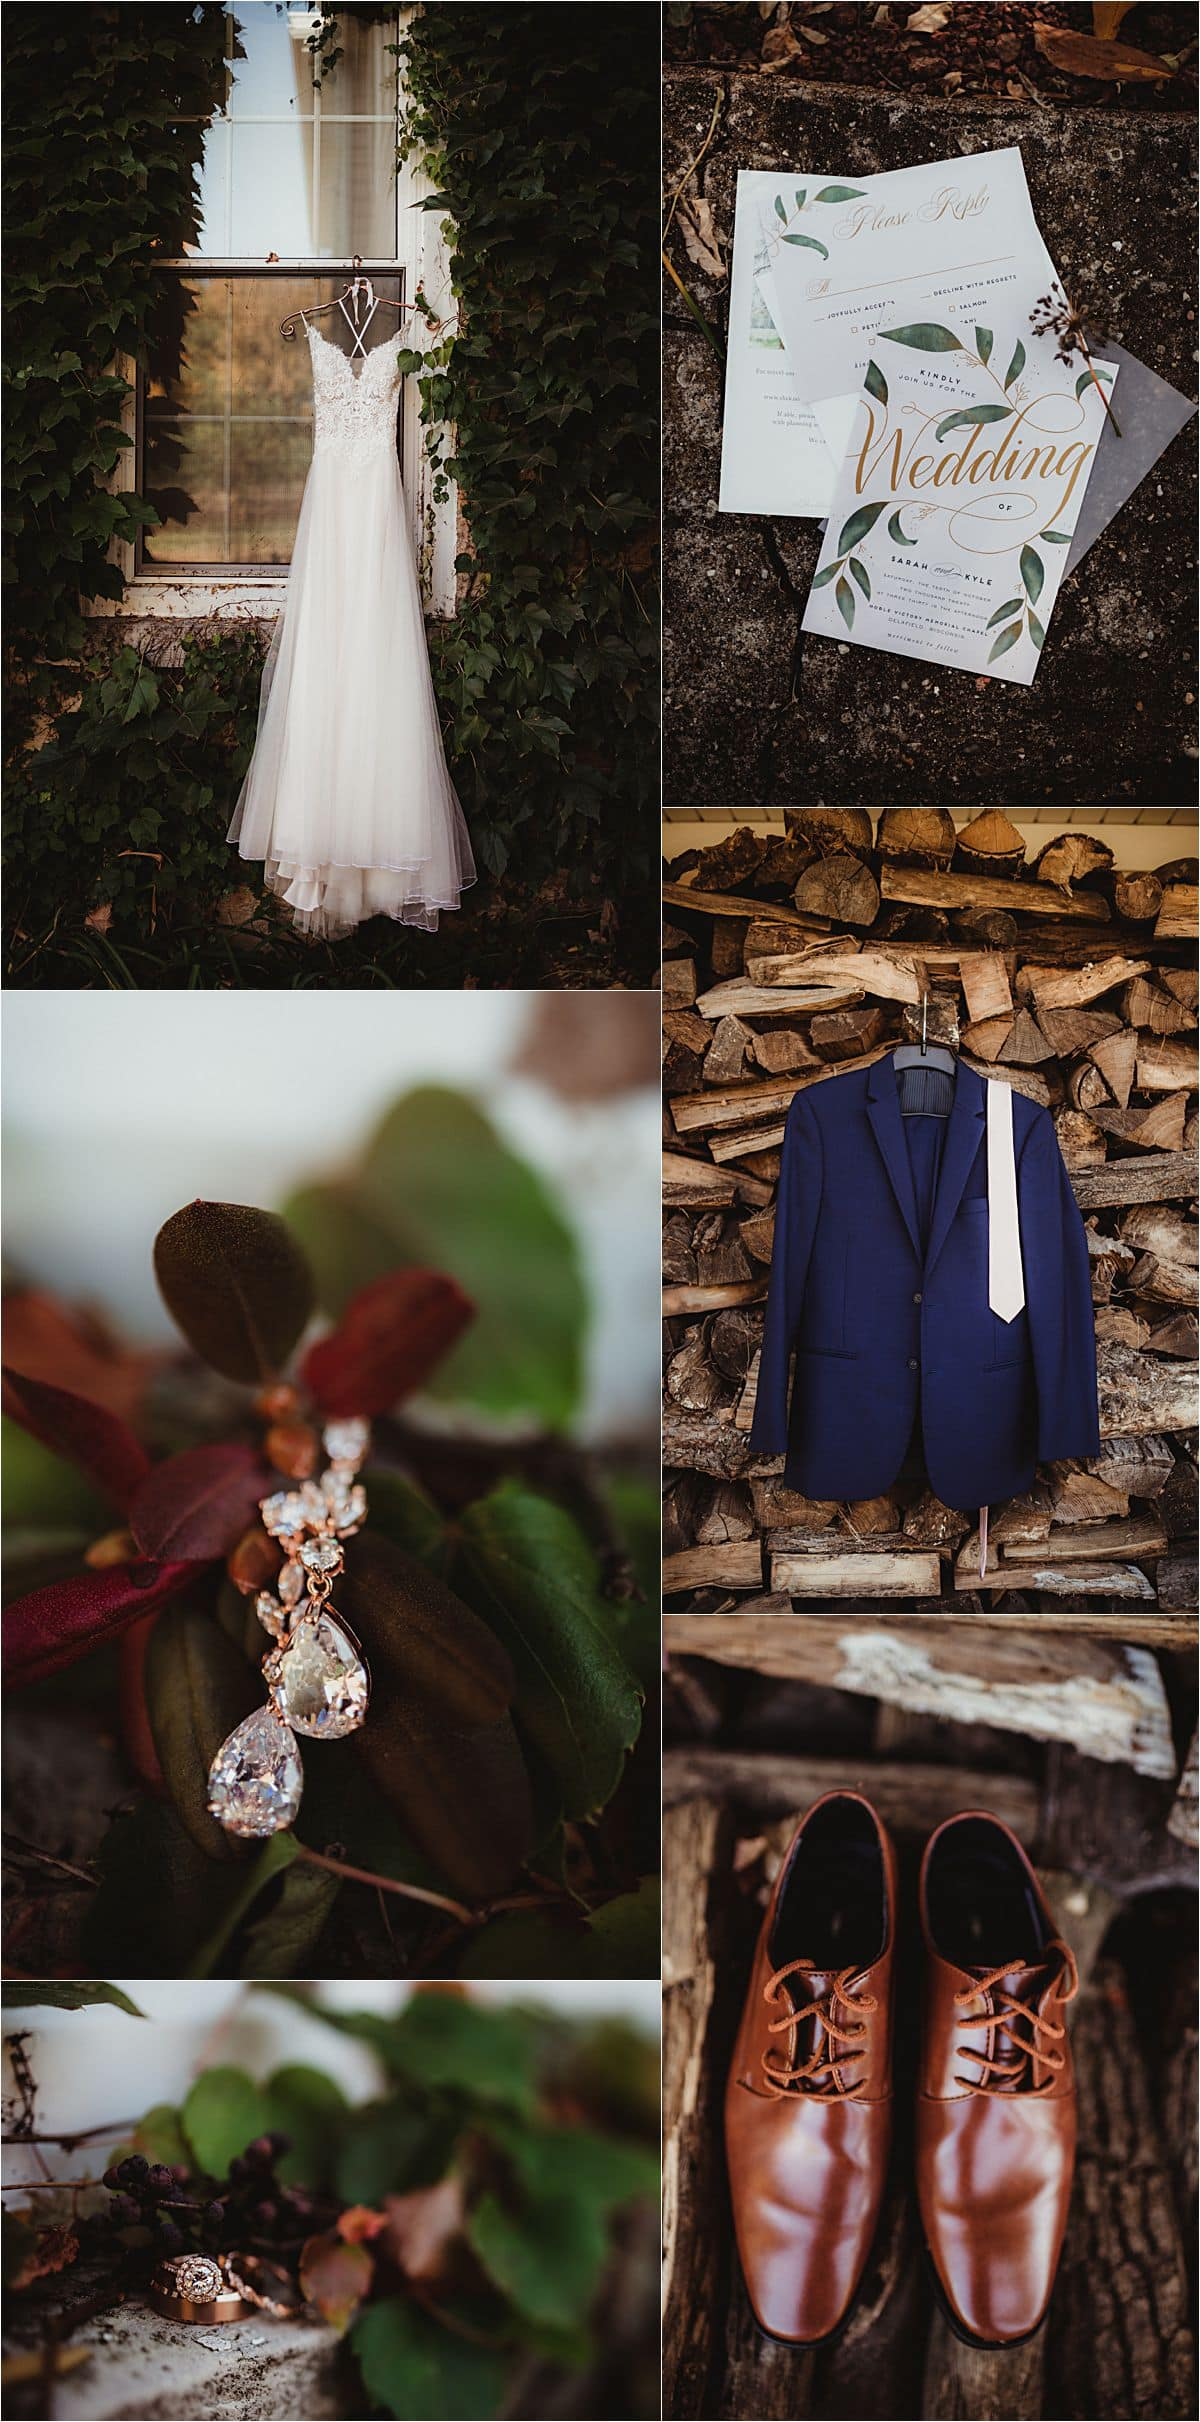 Fall Wedding Ceremony Getting Ready Details